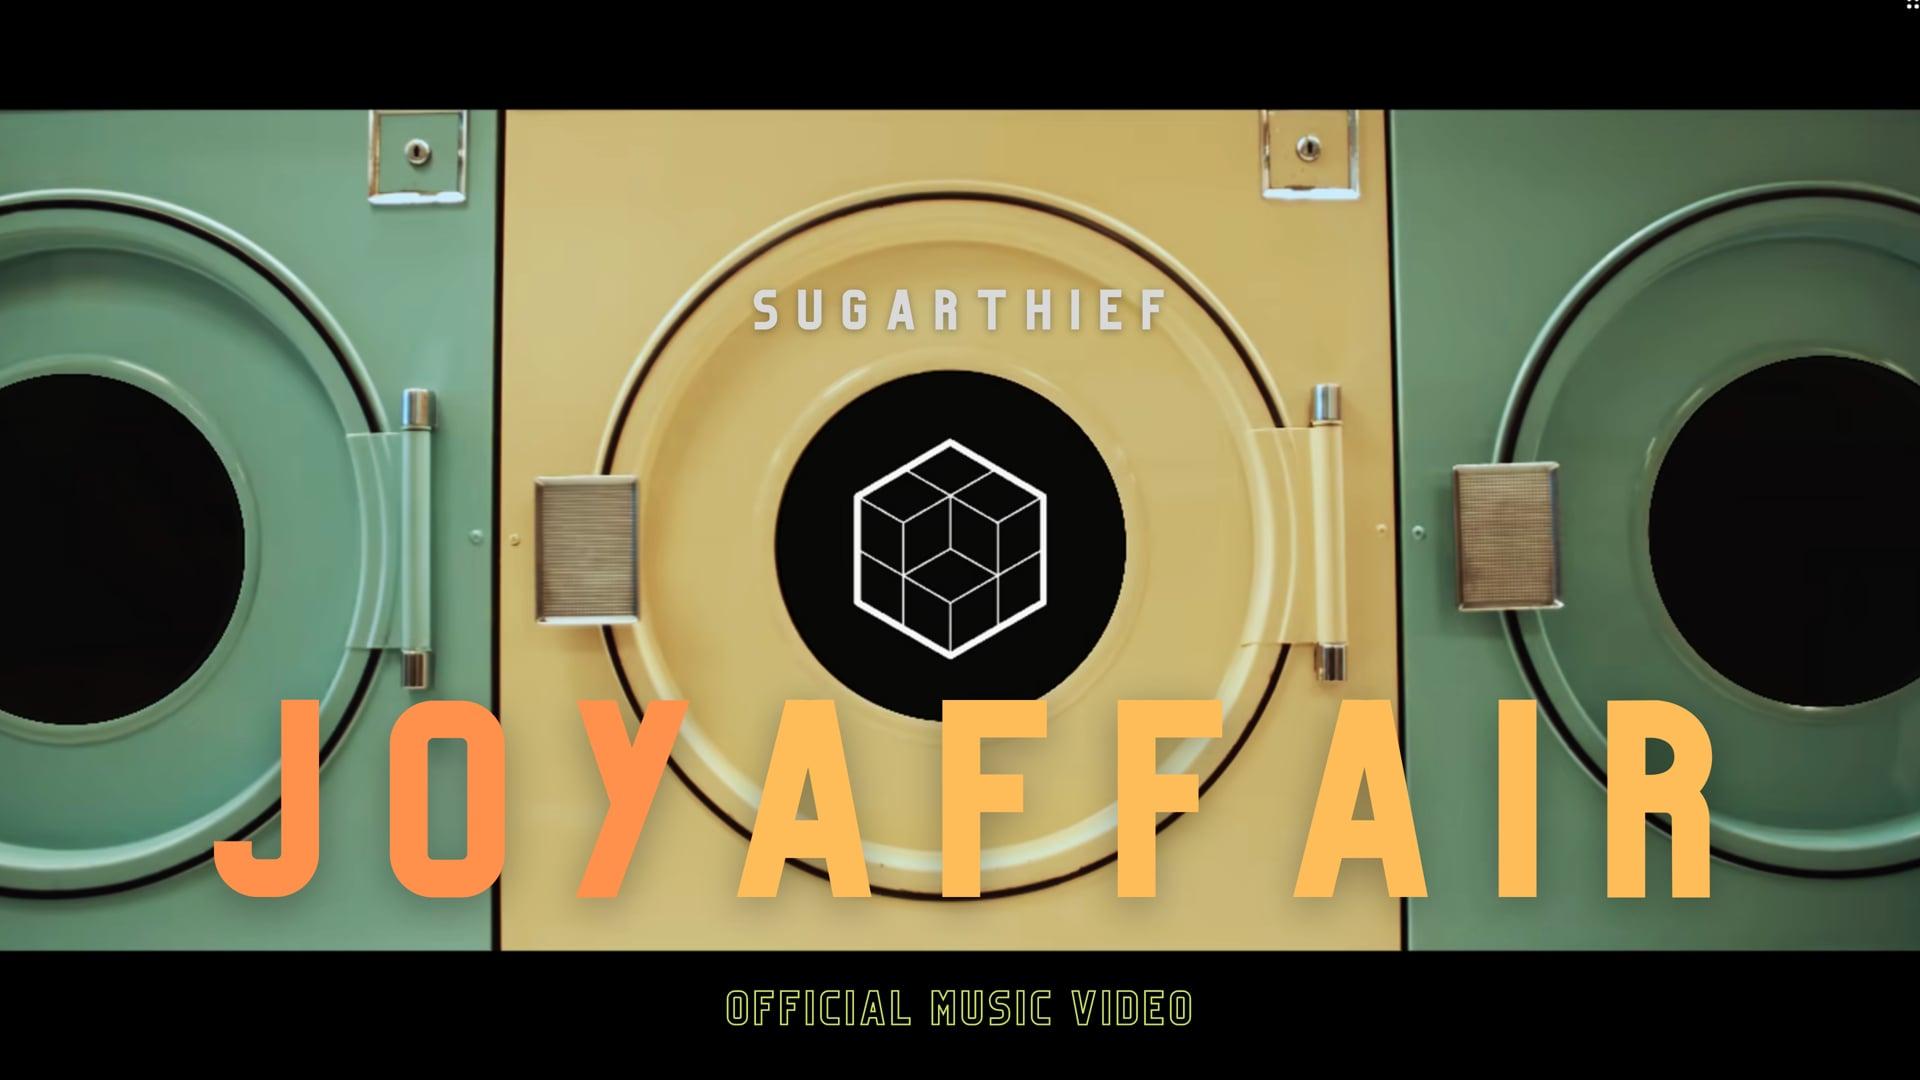 Sugarthief - Joy Affair (Official Music Video)